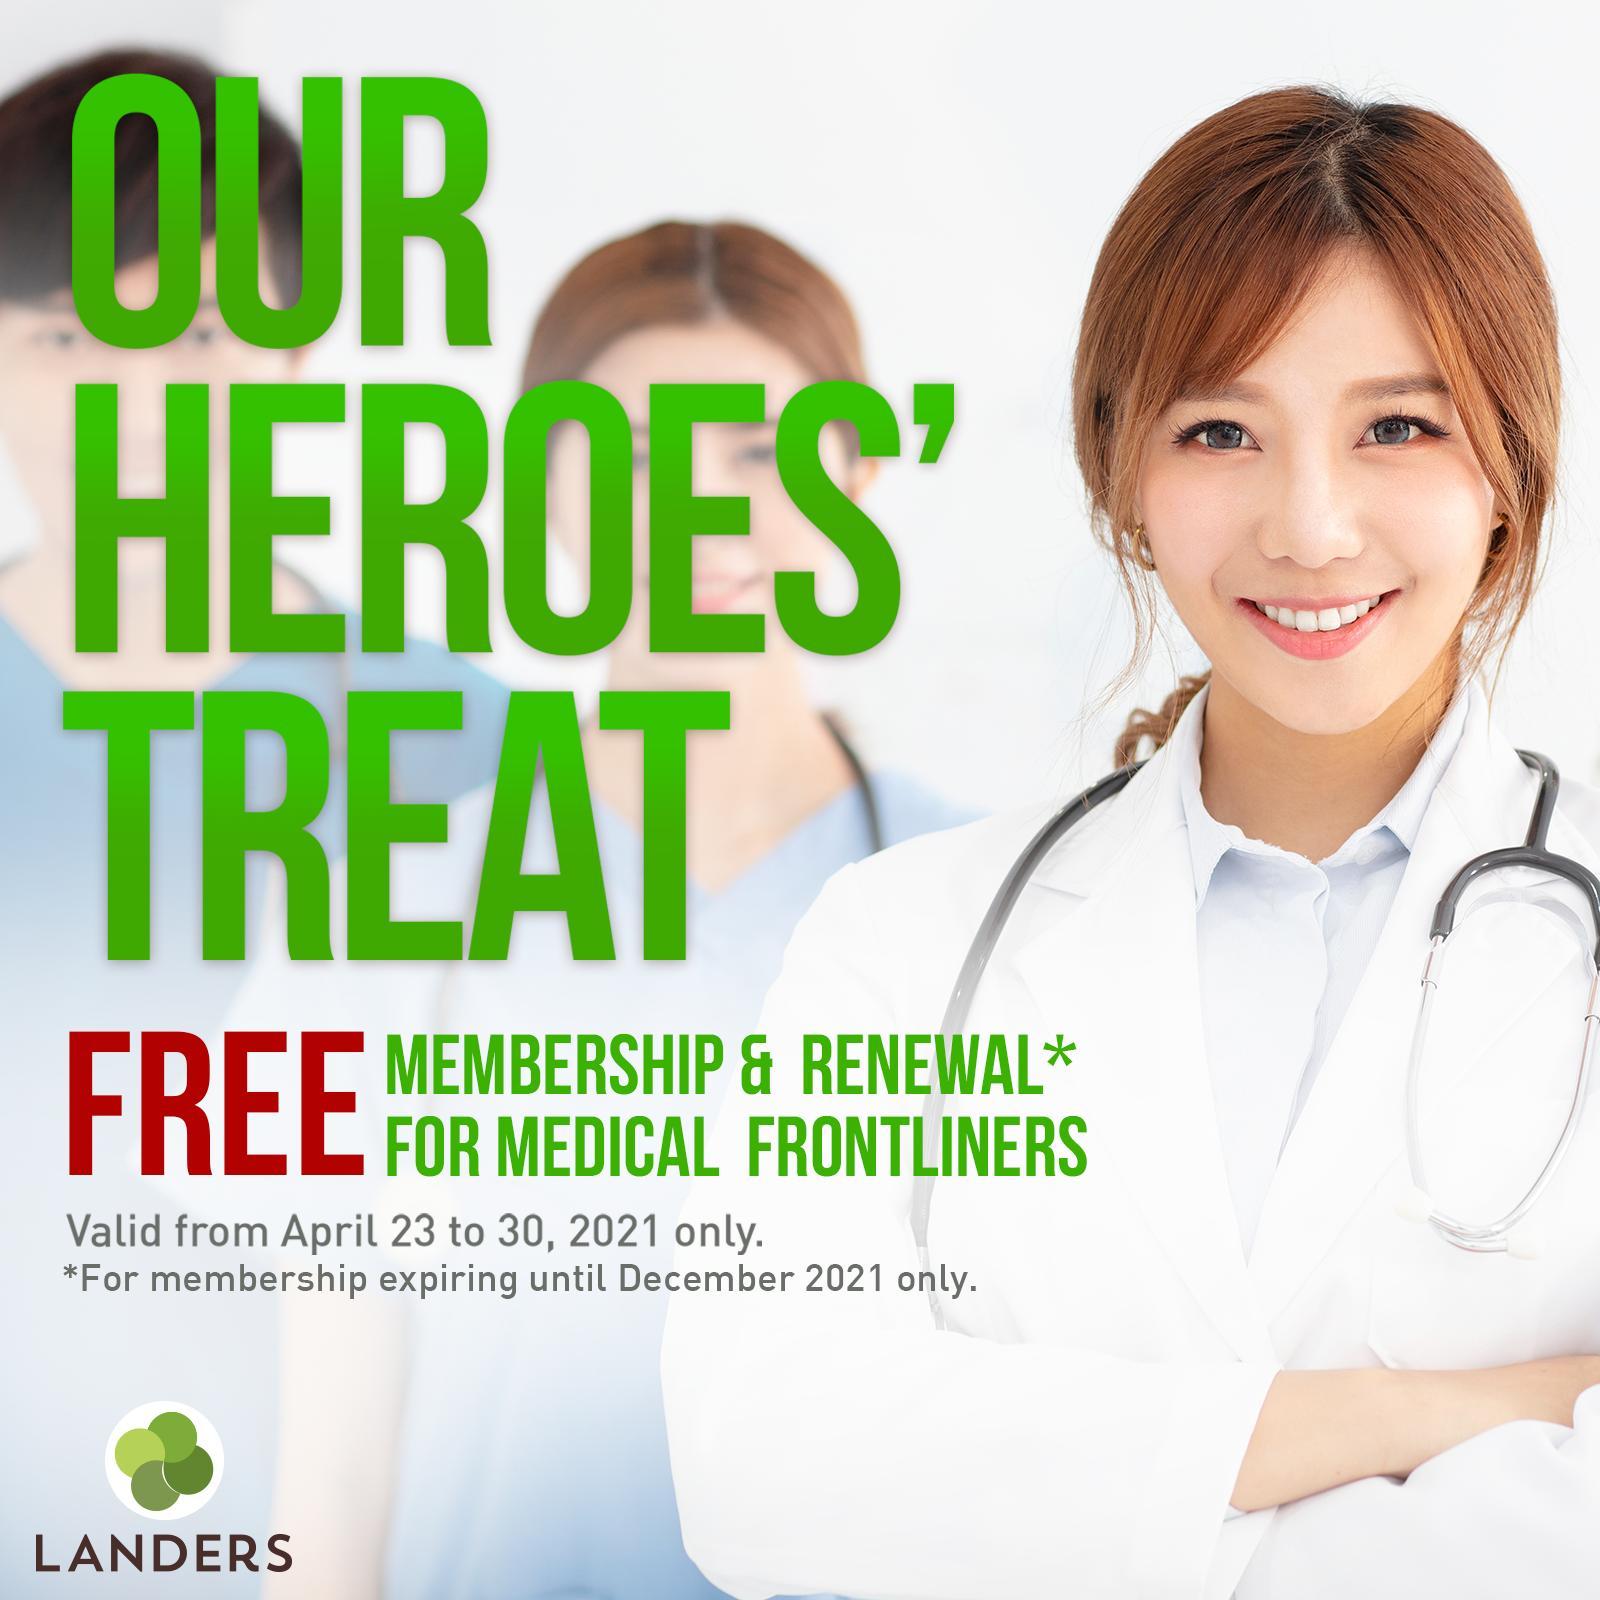 Medical frontliners entitled to free Landers membership and renewal